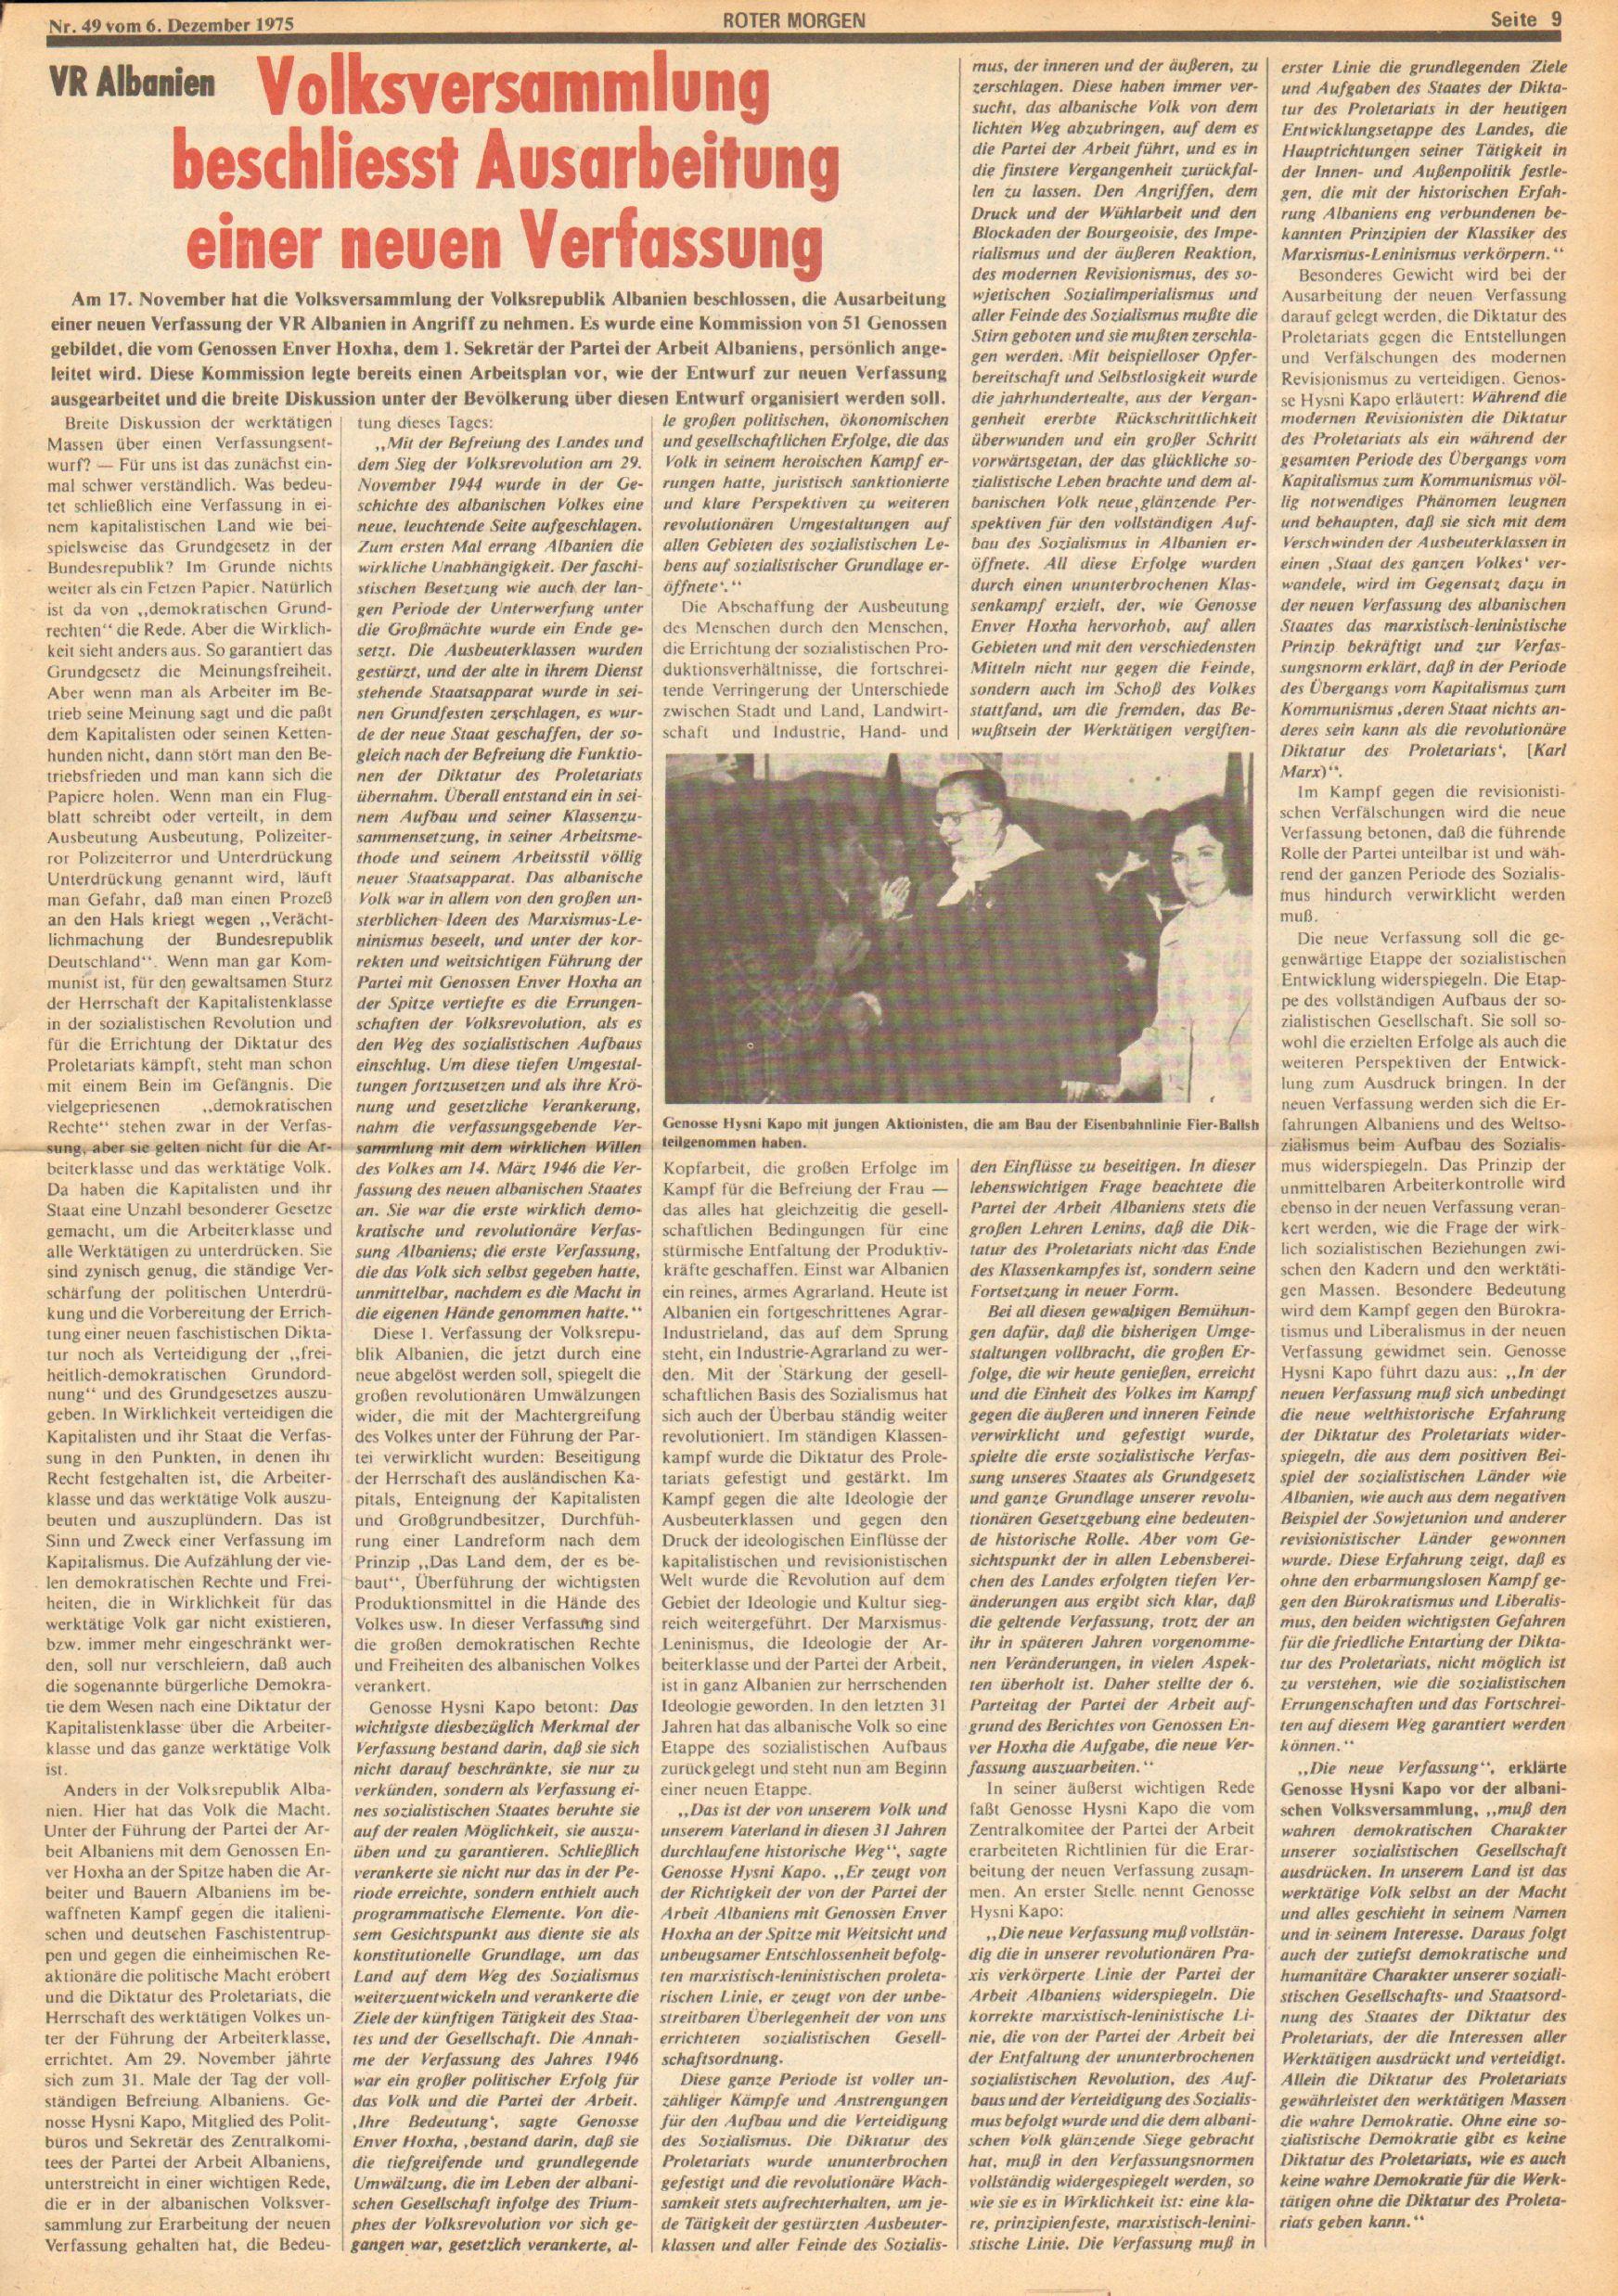 Roter Morgen, 9. Jg., 6. Dezember 1975, Nr. 49, Seite 9